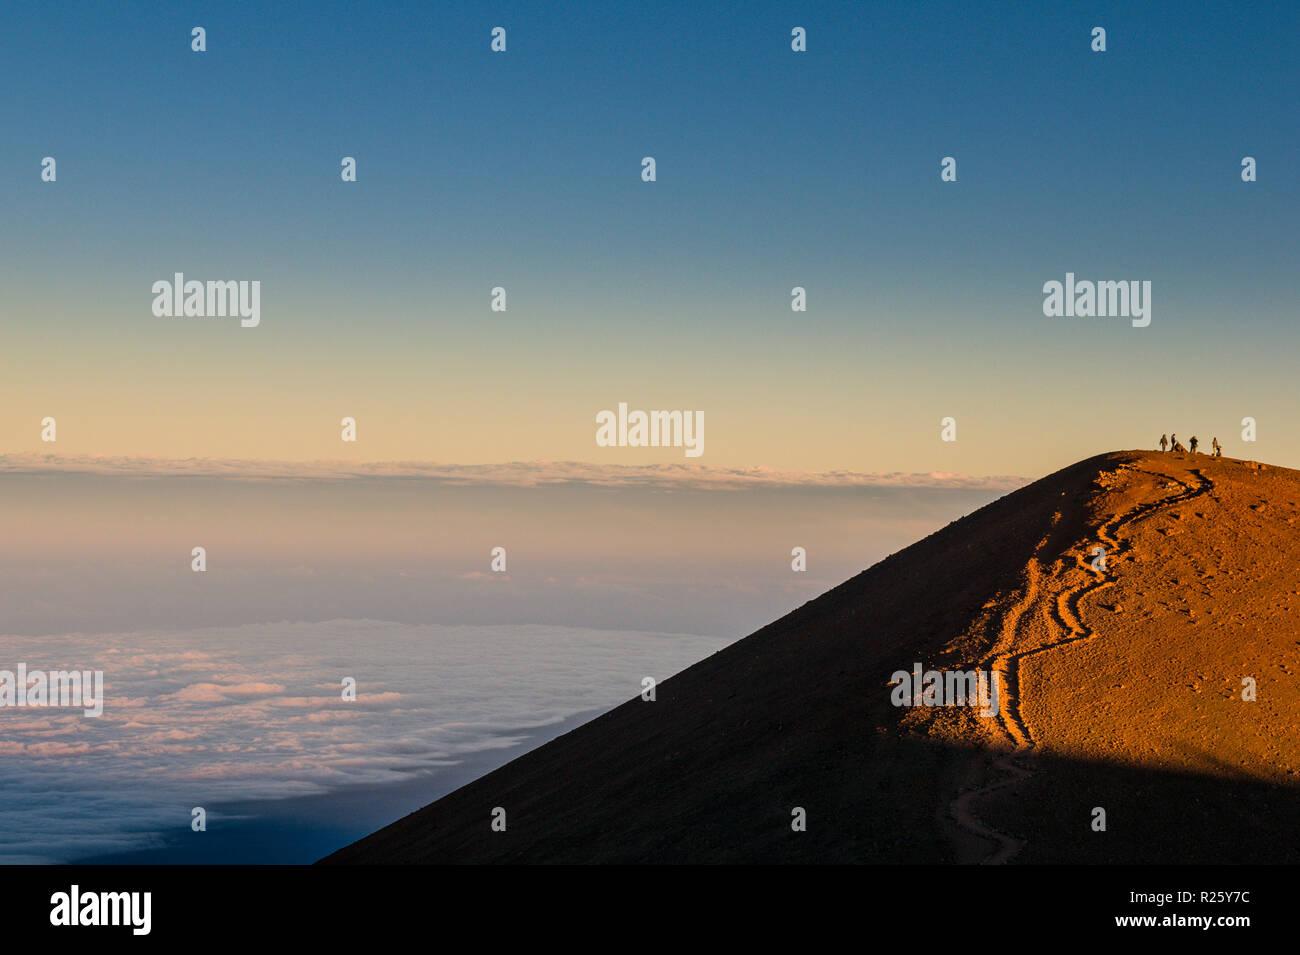 Tourists on a volcanic cone on top of Mauna Kea, Big Island, Hawaii, USA - Stock Image